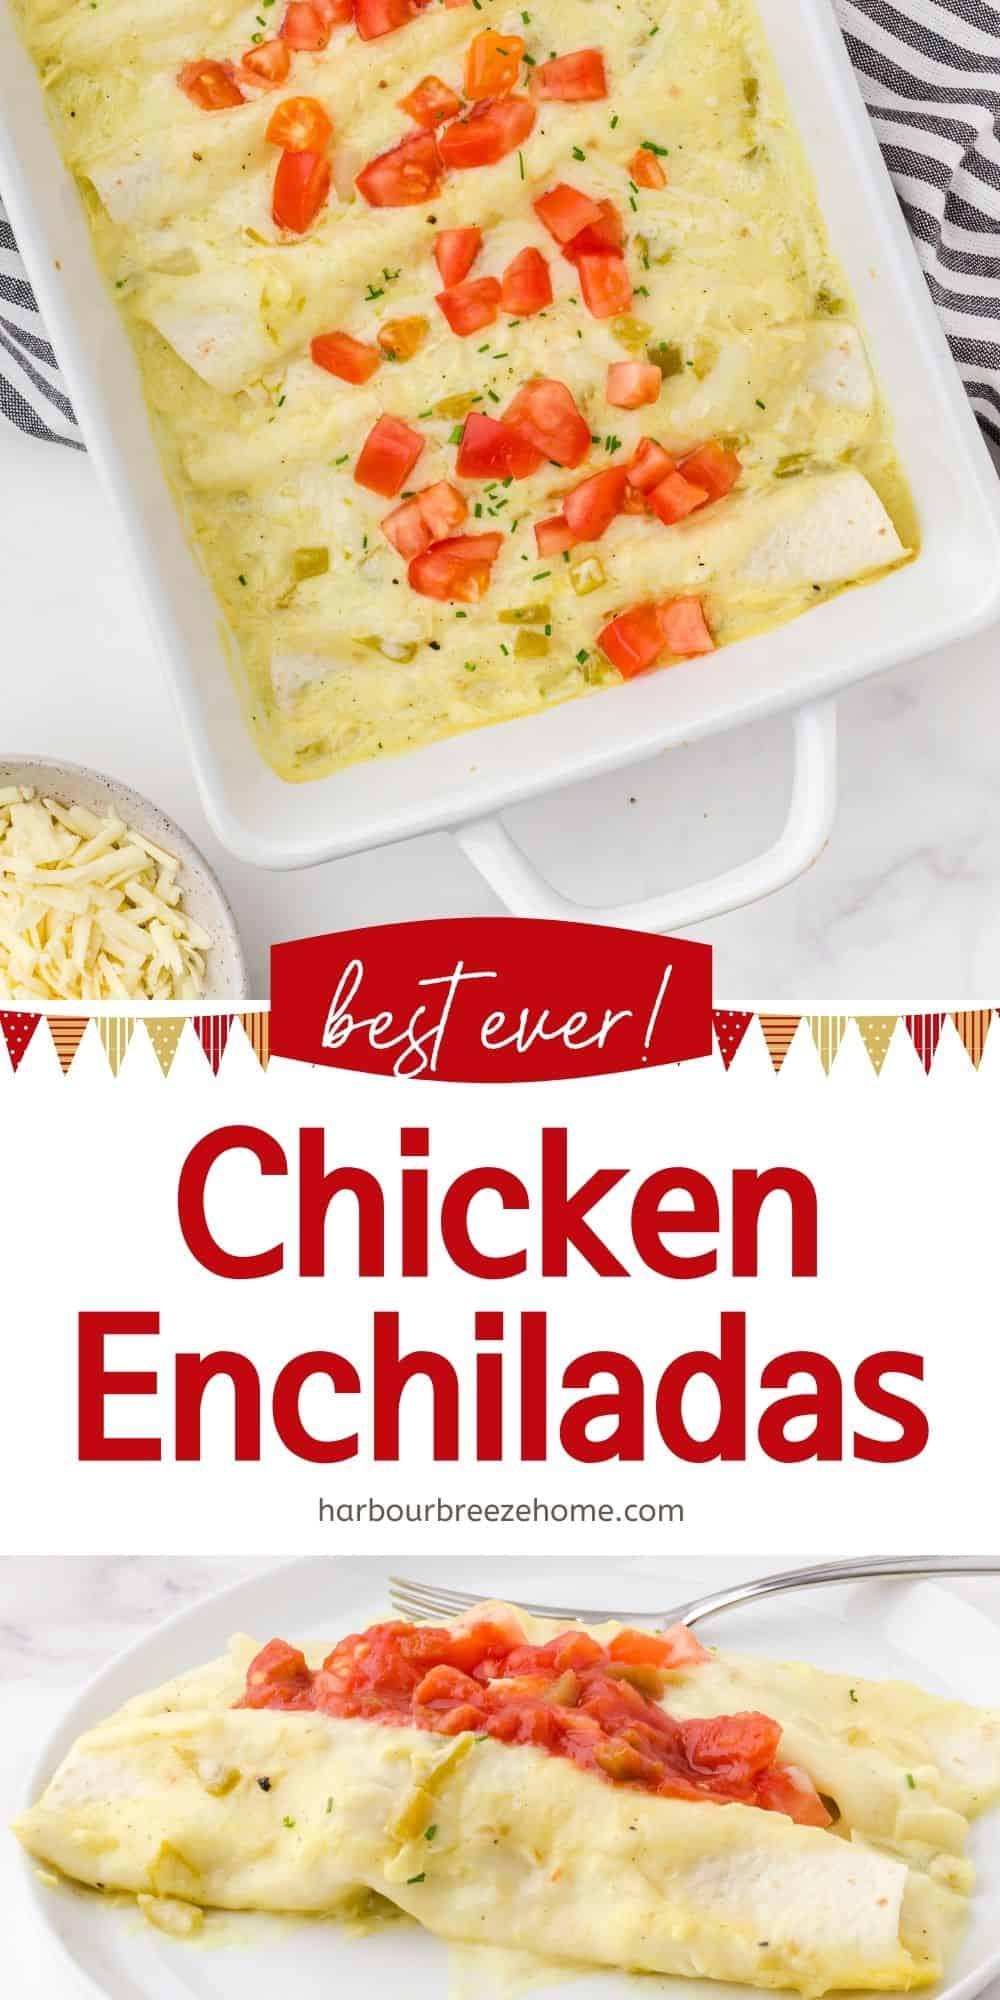 Creamy Chicken Enchiladas - an easy weeknight dinner idea or make ahead freezer meal